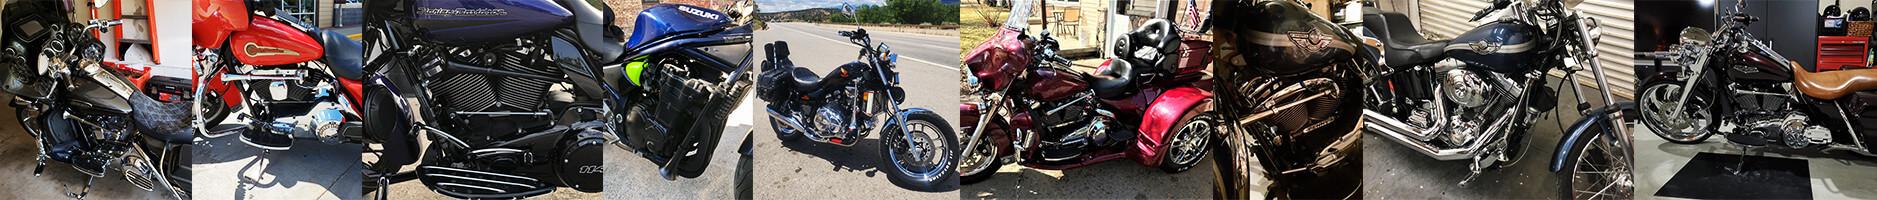 MotoHorn Motorcycle Installations